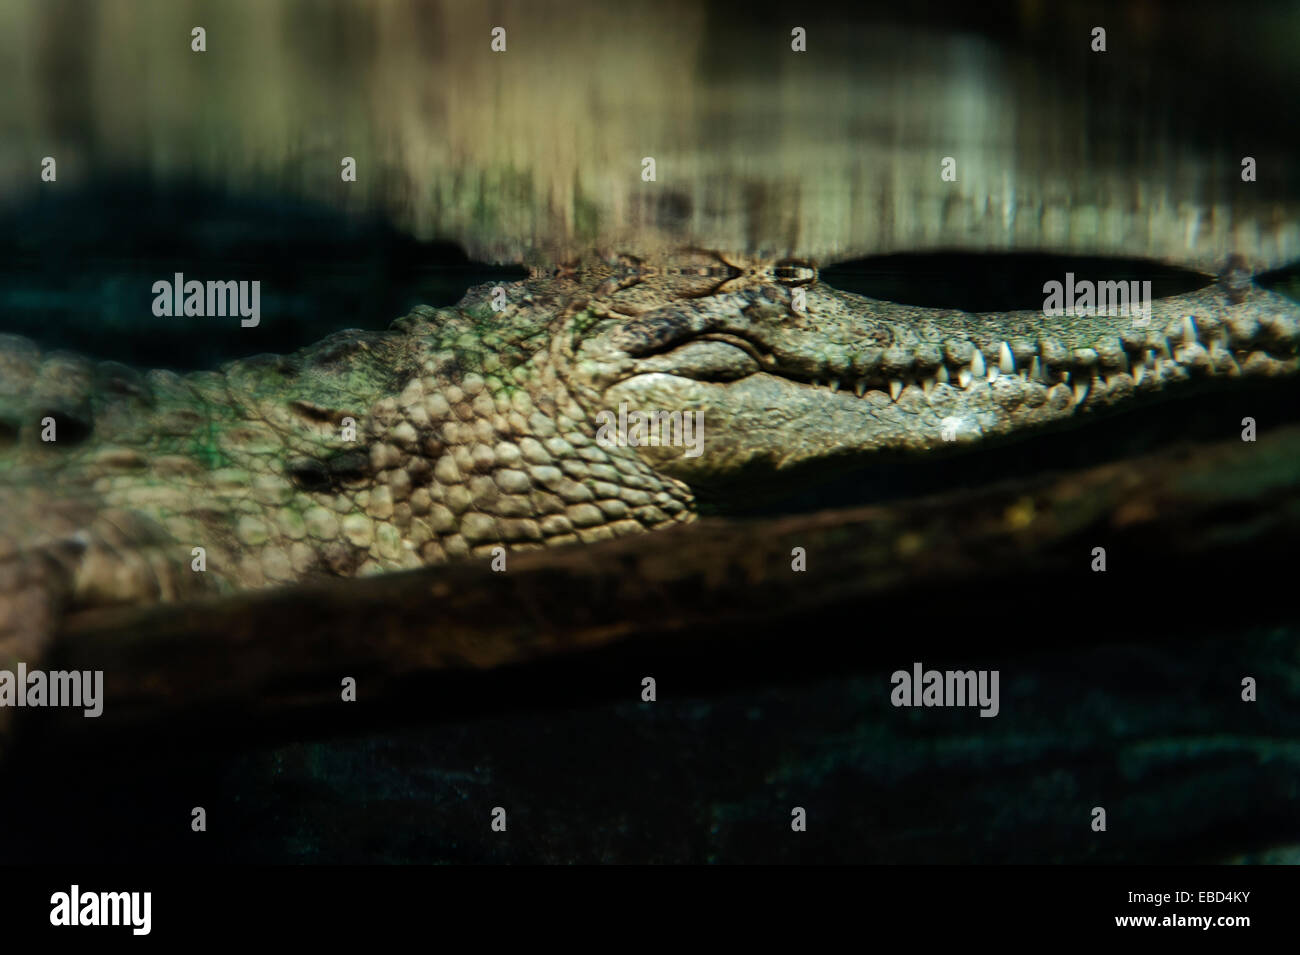 Crocodile in murky swamp water. - Stock Image